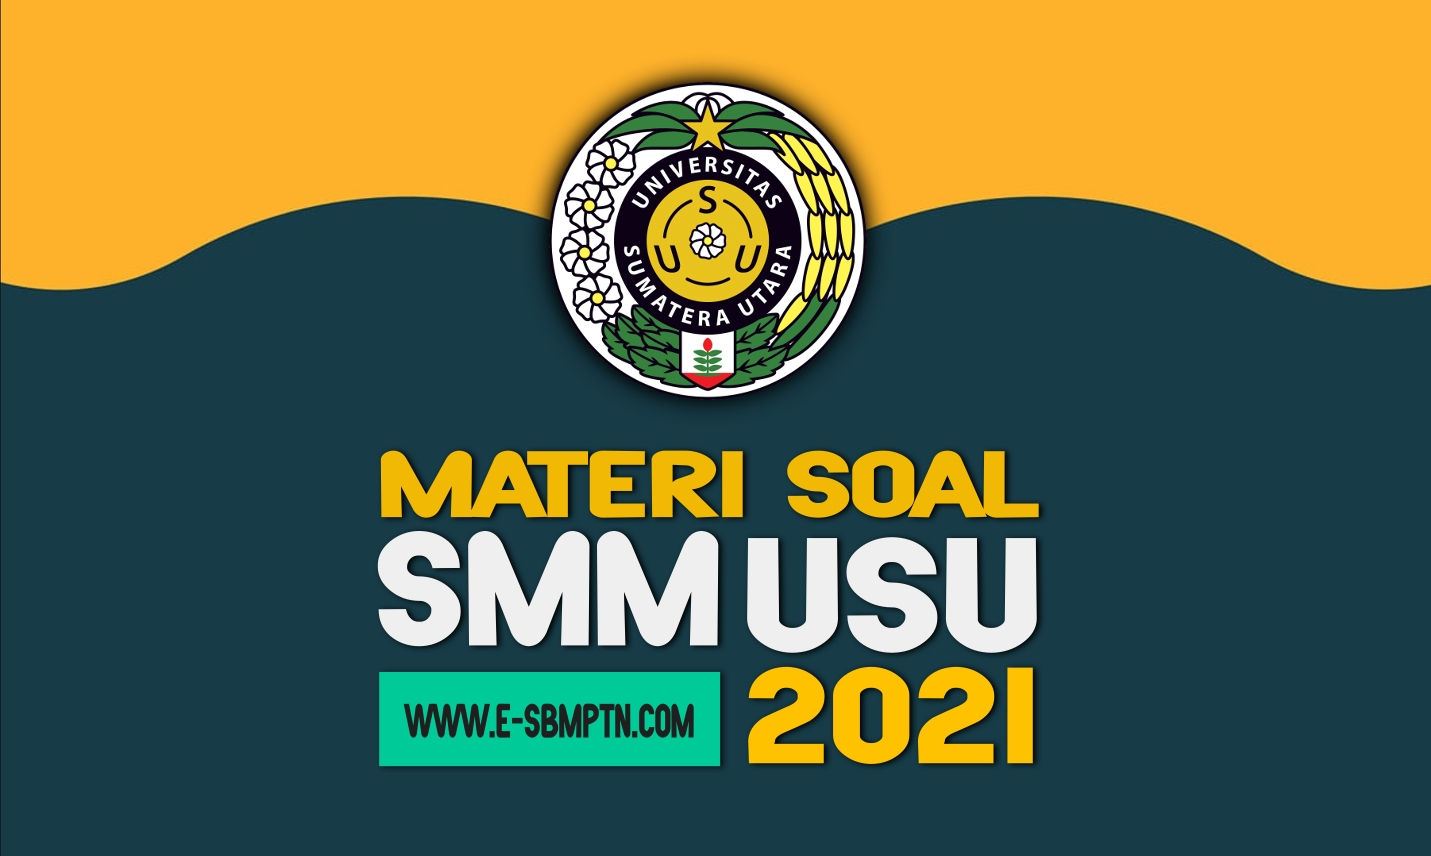 SOAL SMM USU 2021